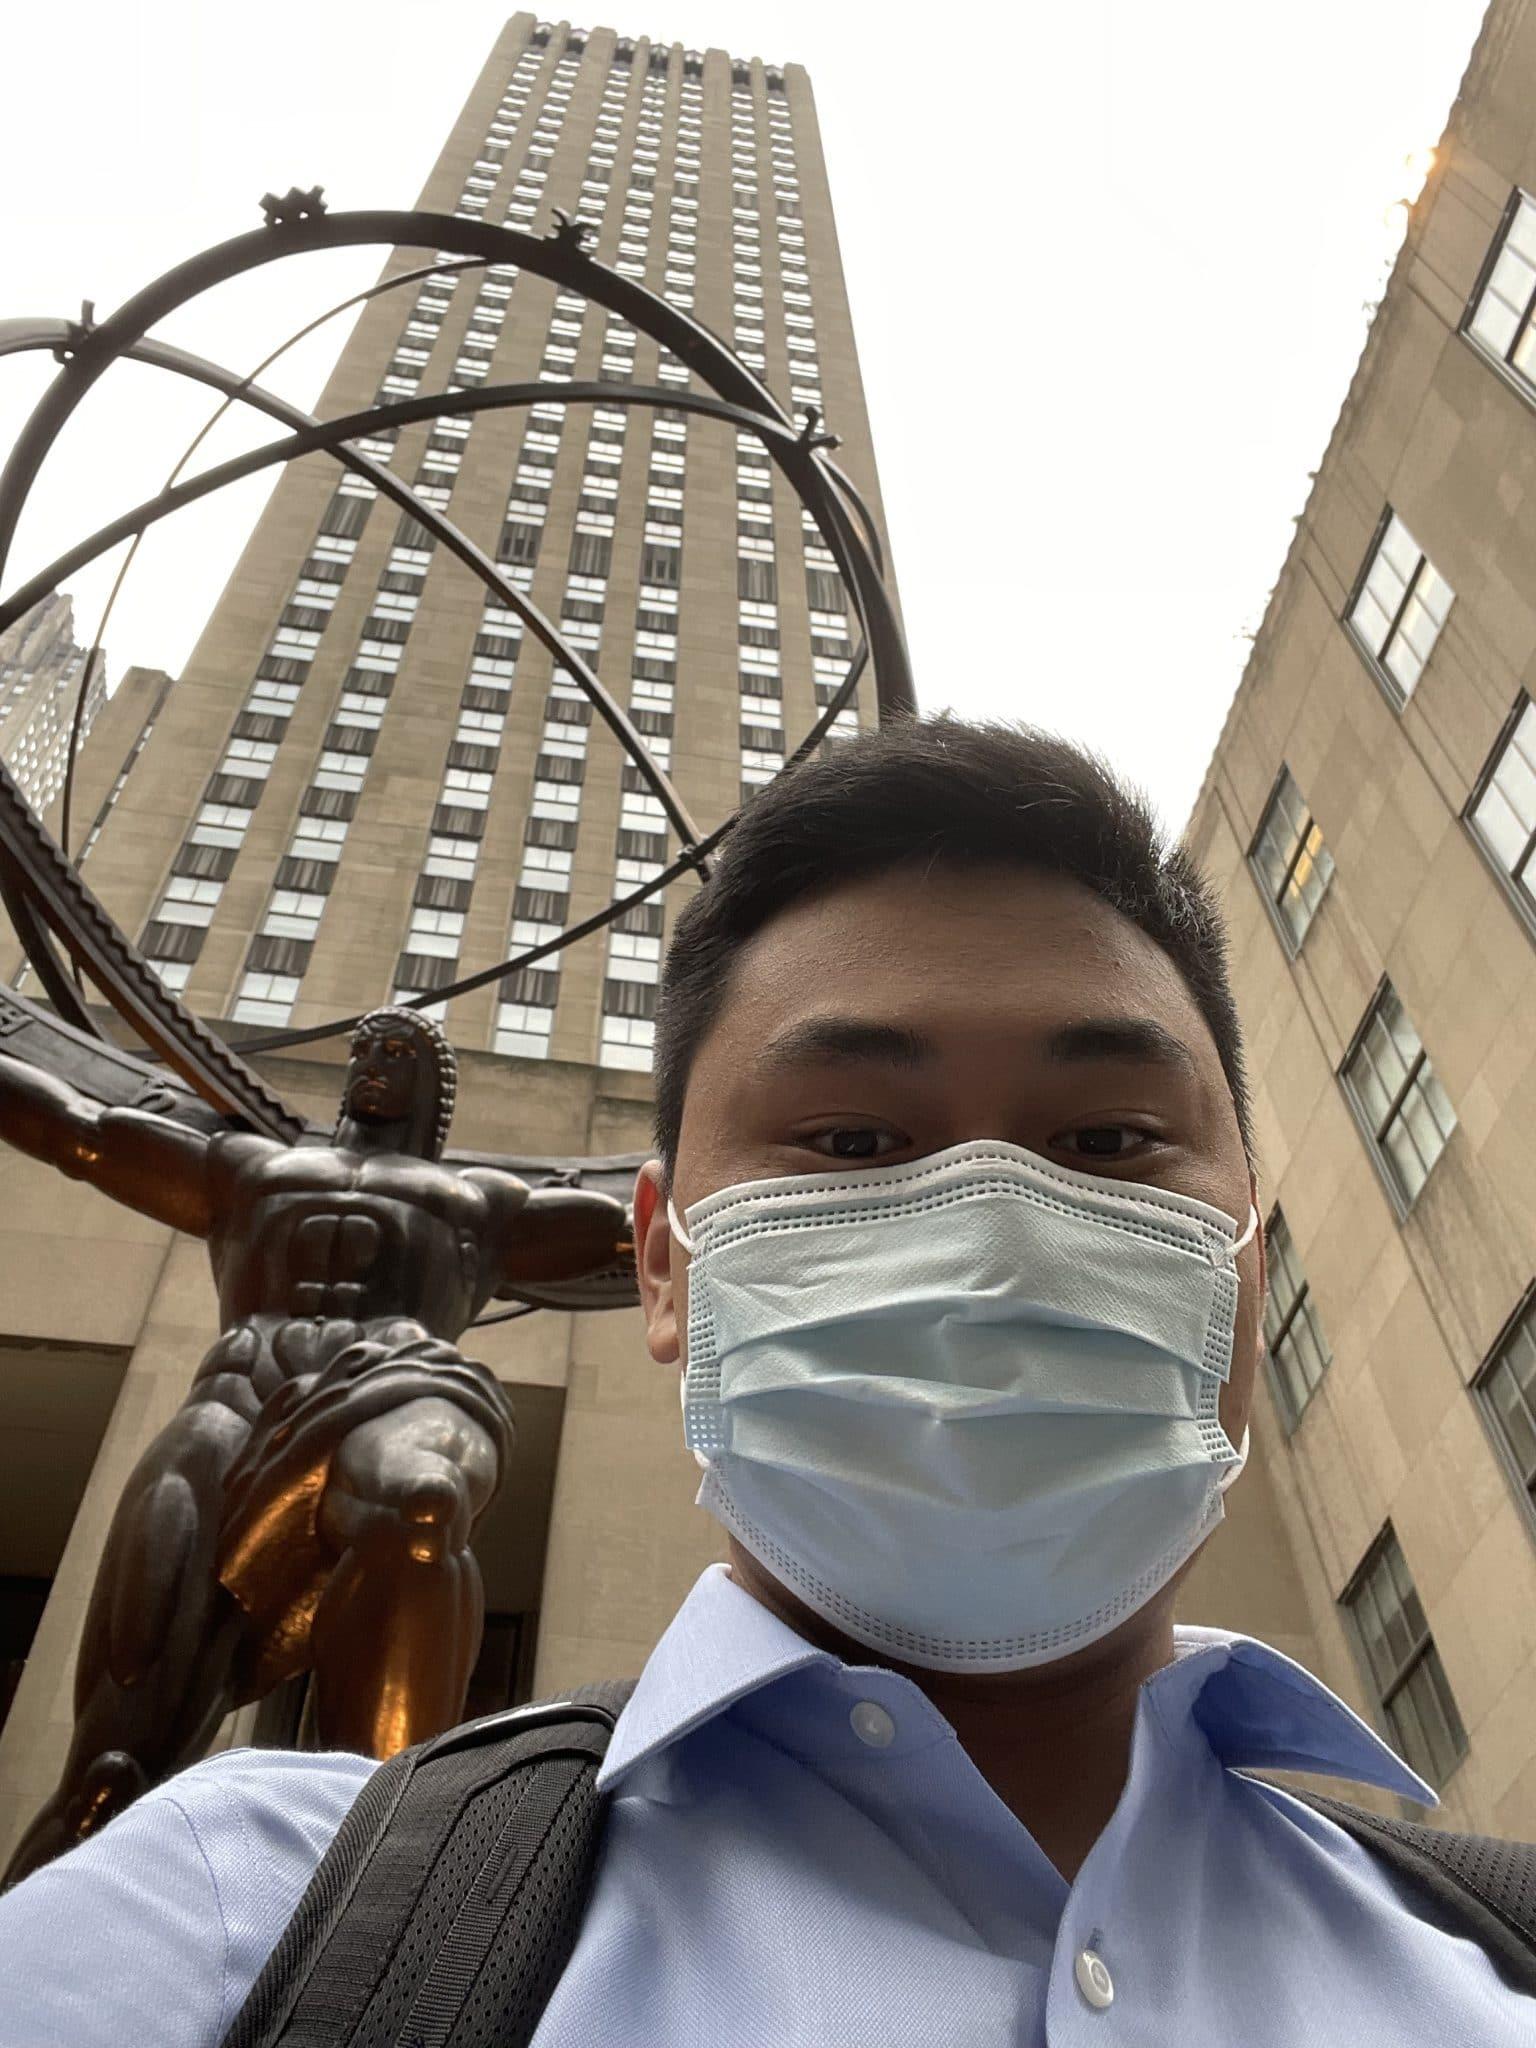 Kyle Nguyen takes a selfie in front of Rockefeller Plaza